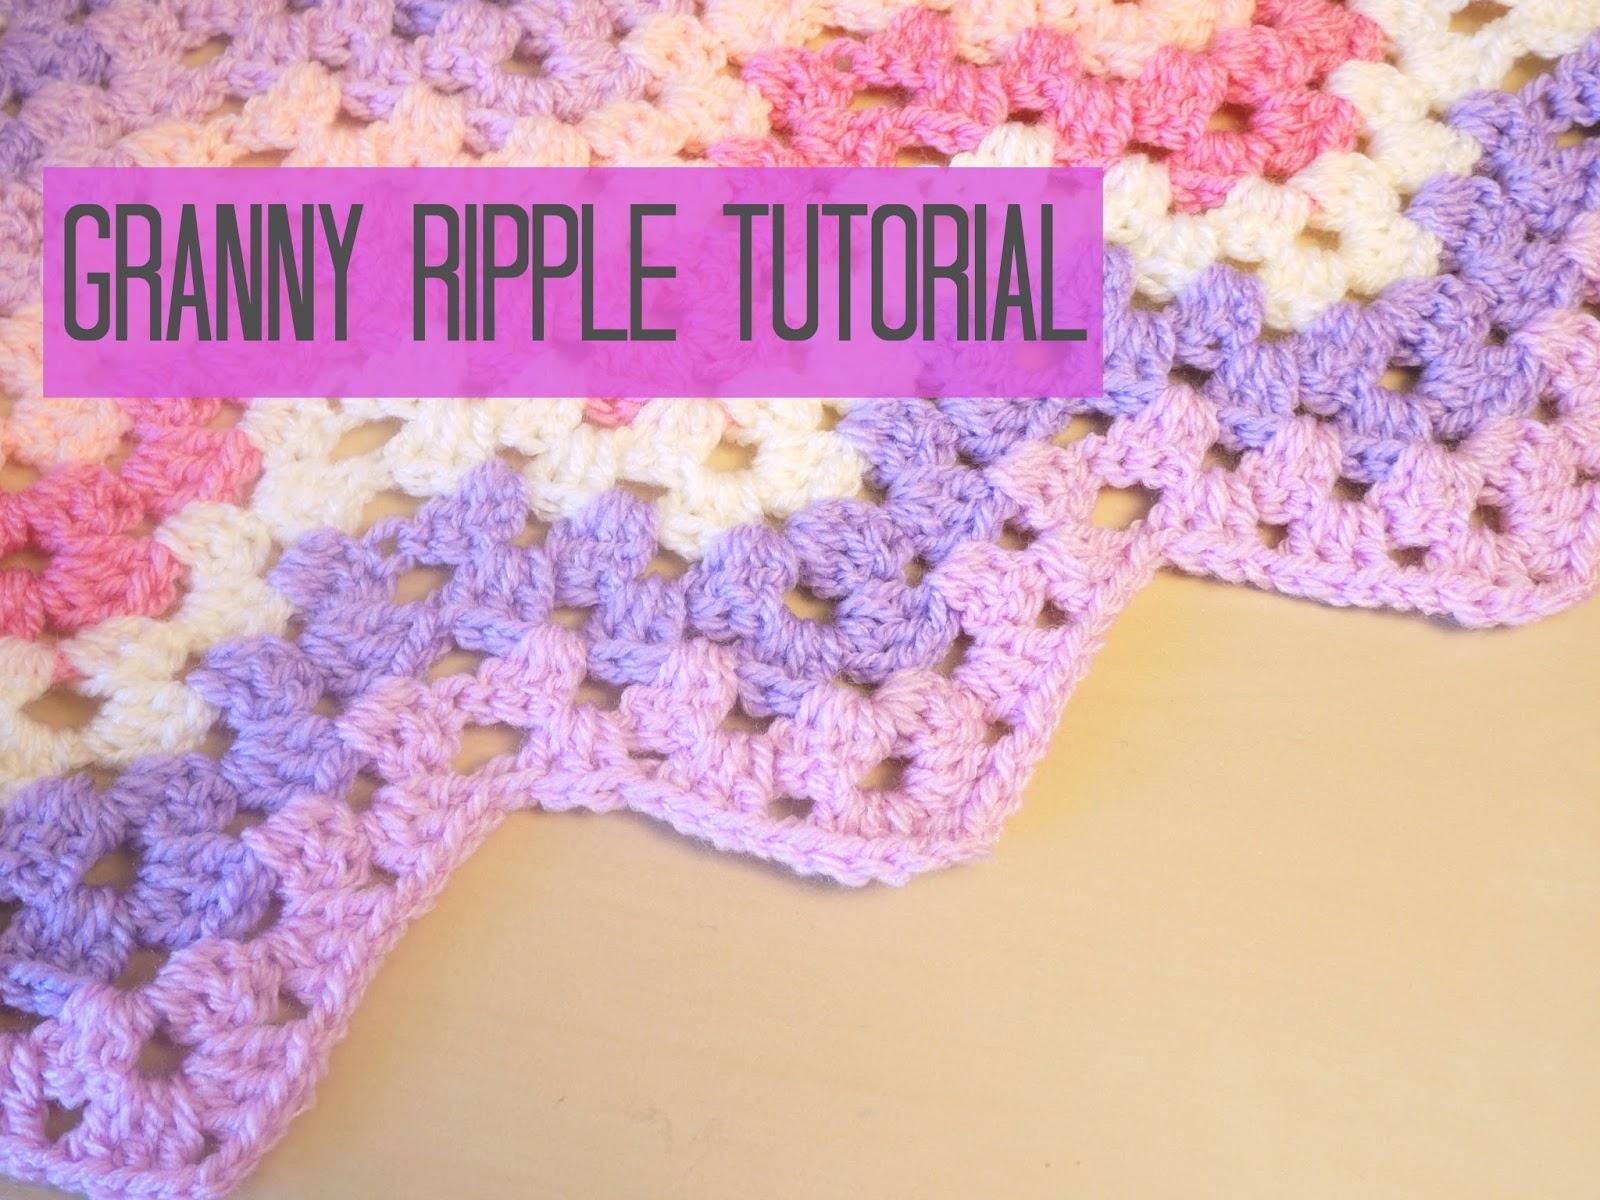 Granny Ripple Stitch Tutorial: September 2014